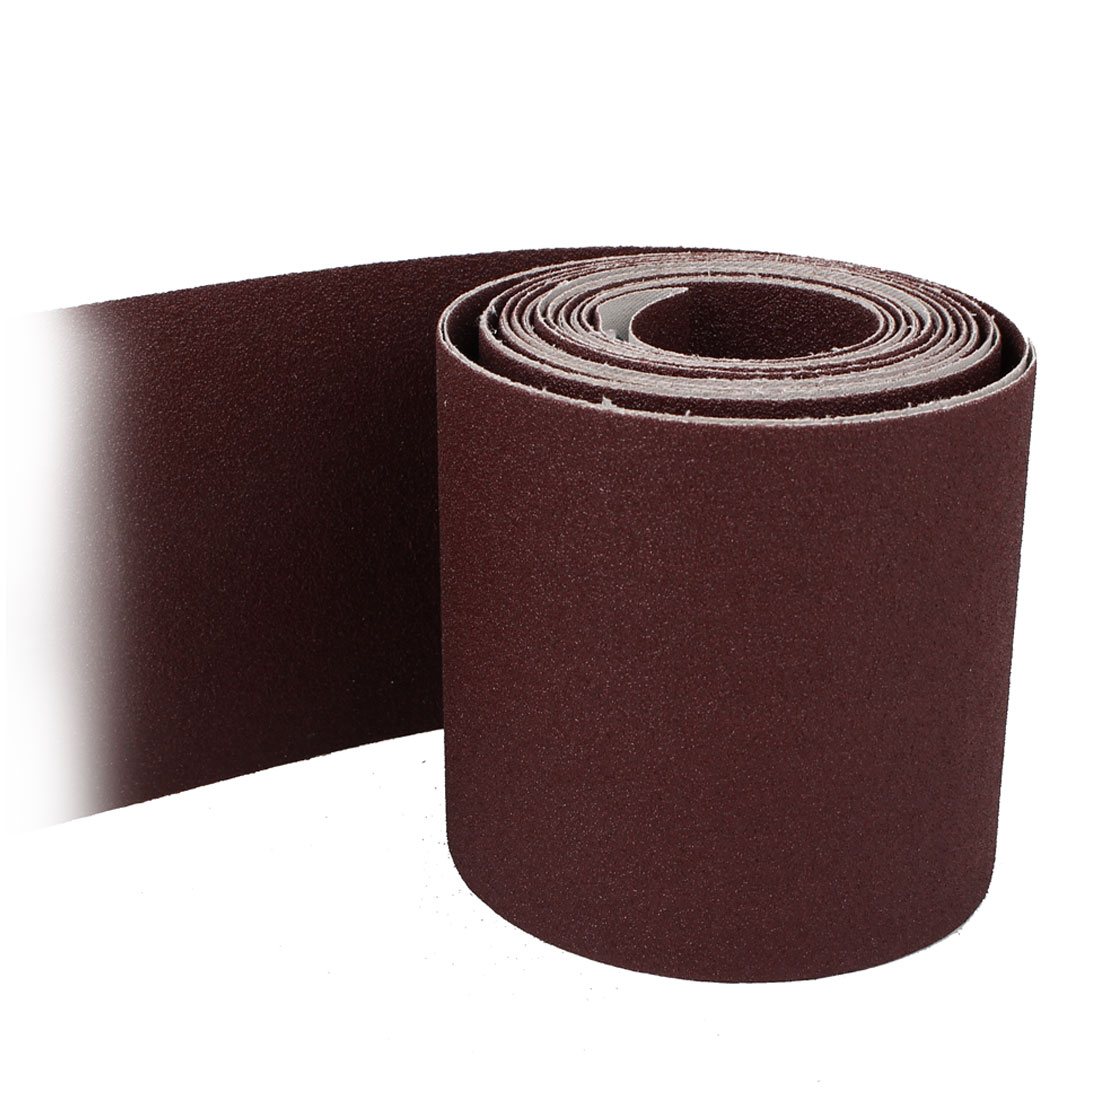 5M Long 100mm Width 80 Grit Abrasive Sanding Sand Paper Sandpaper